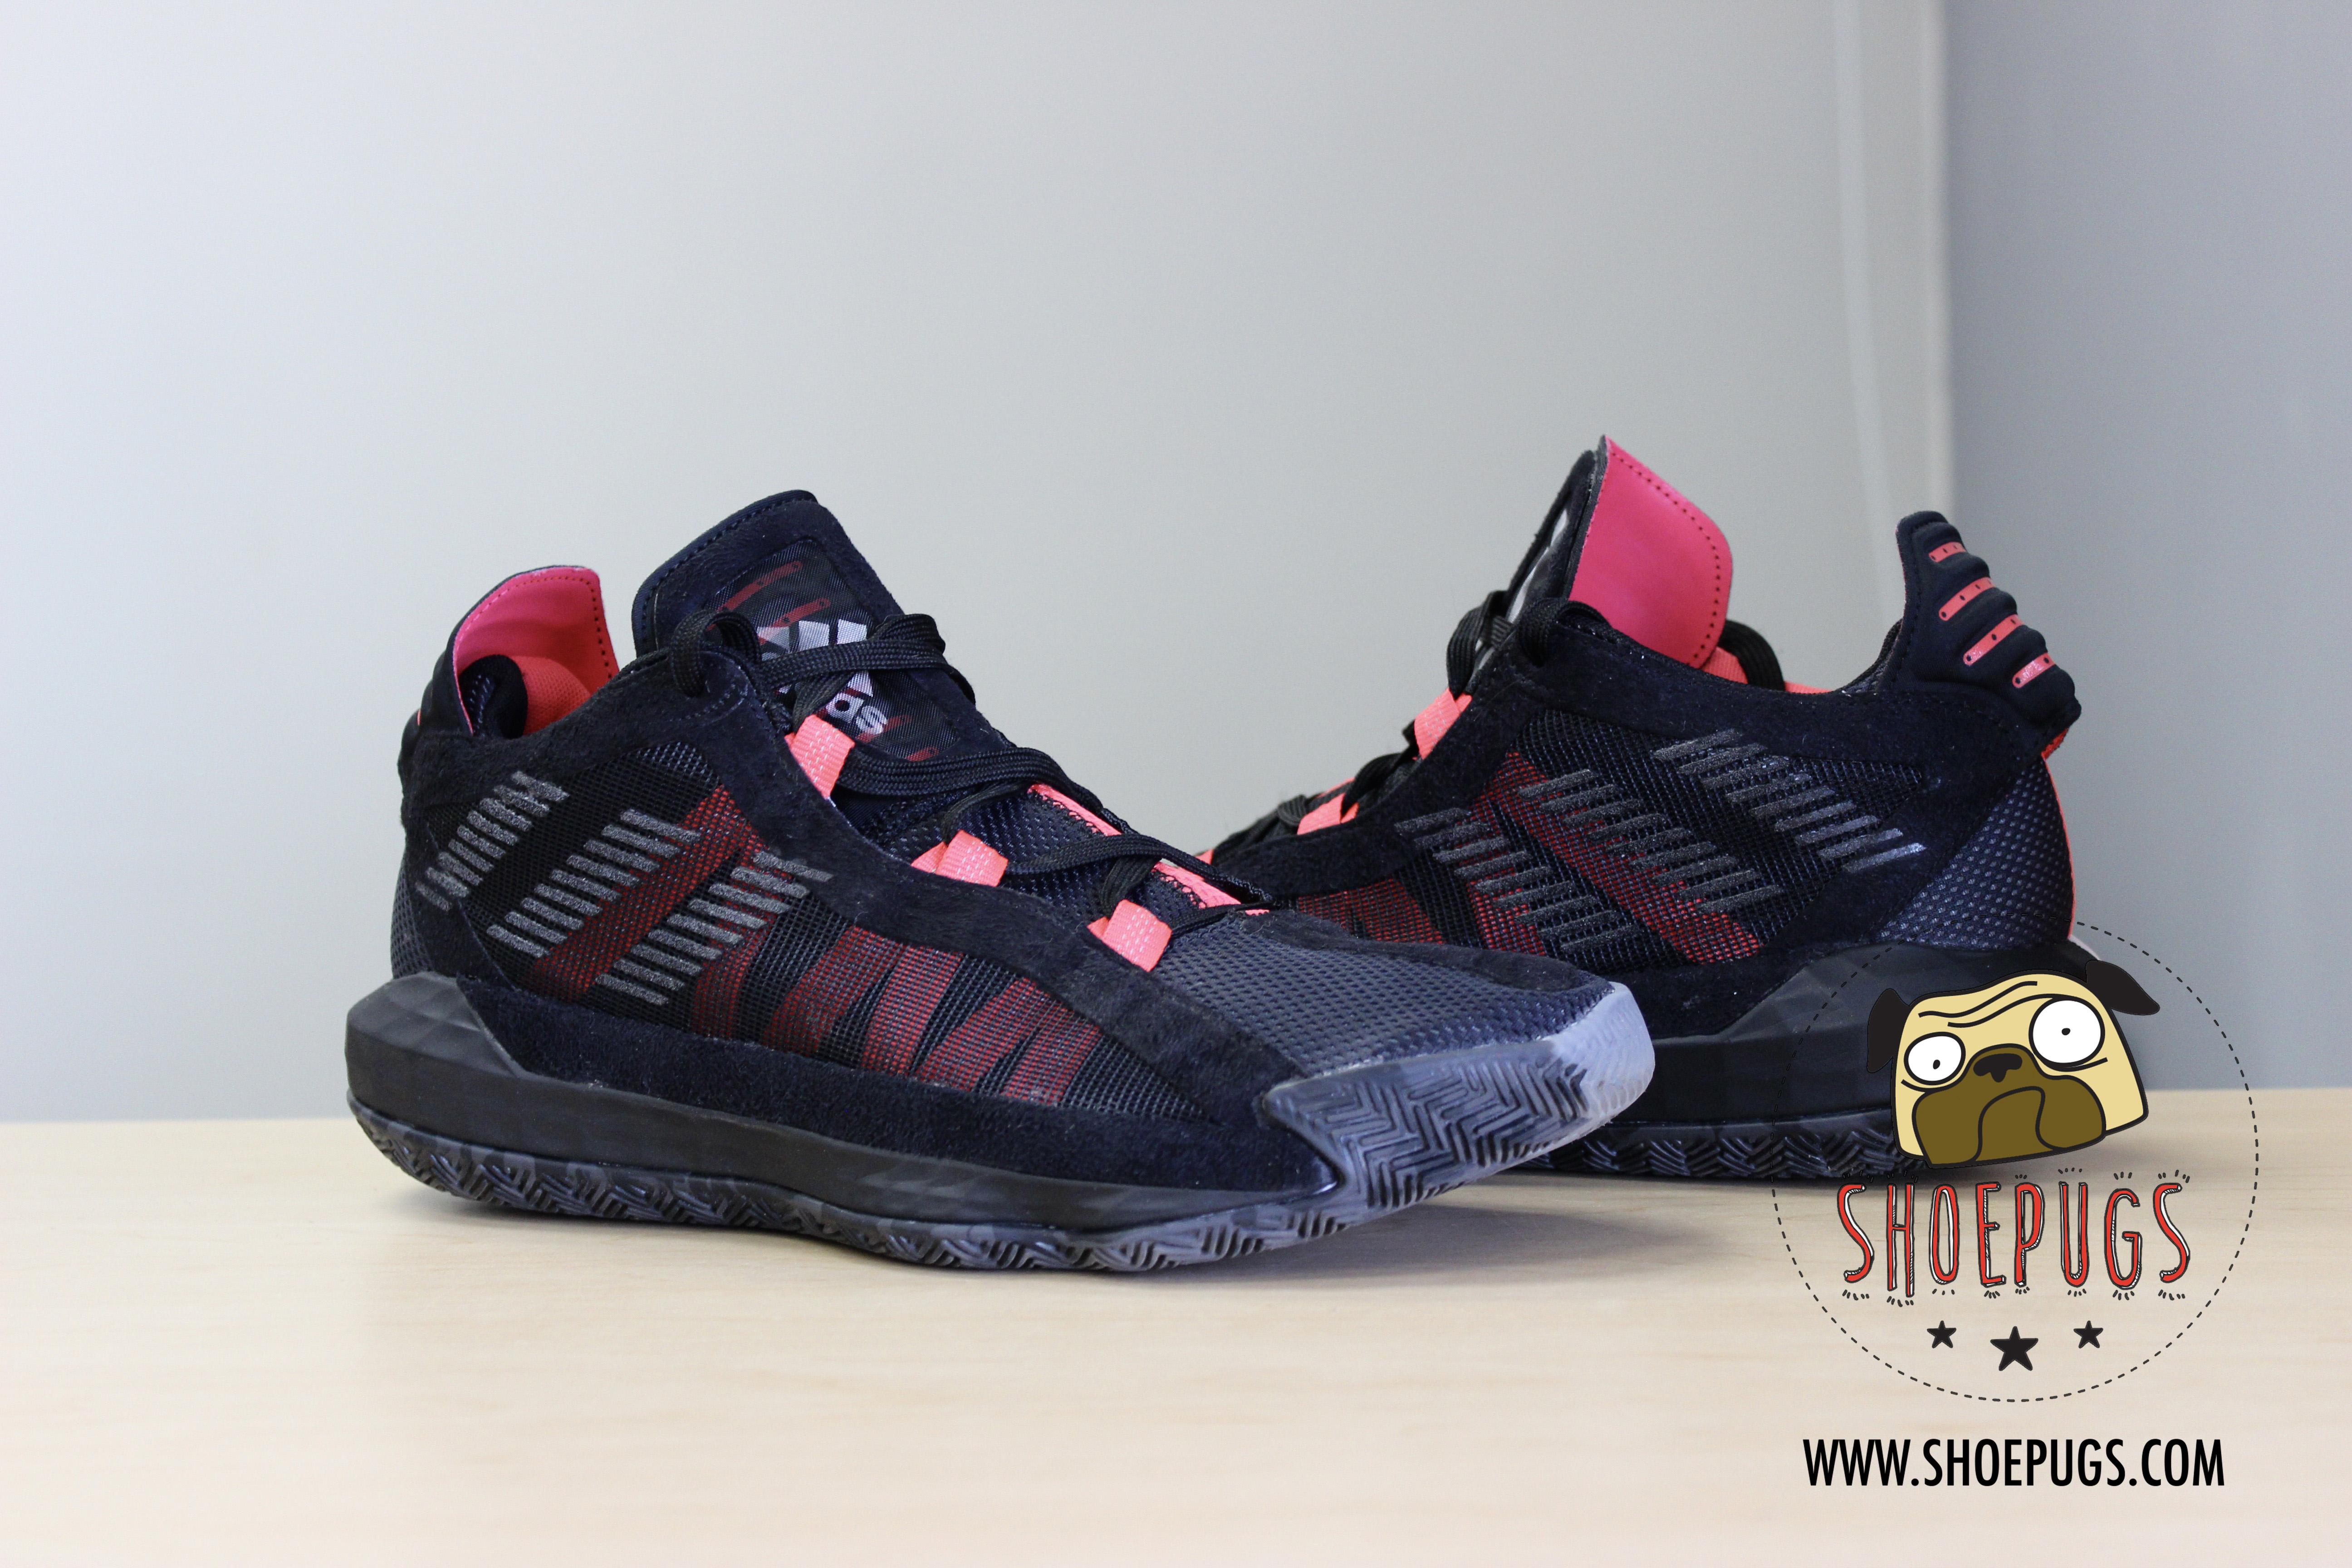 Adidas 2019 Adidas Dame 6 Black Red Damian Lillard Grailed